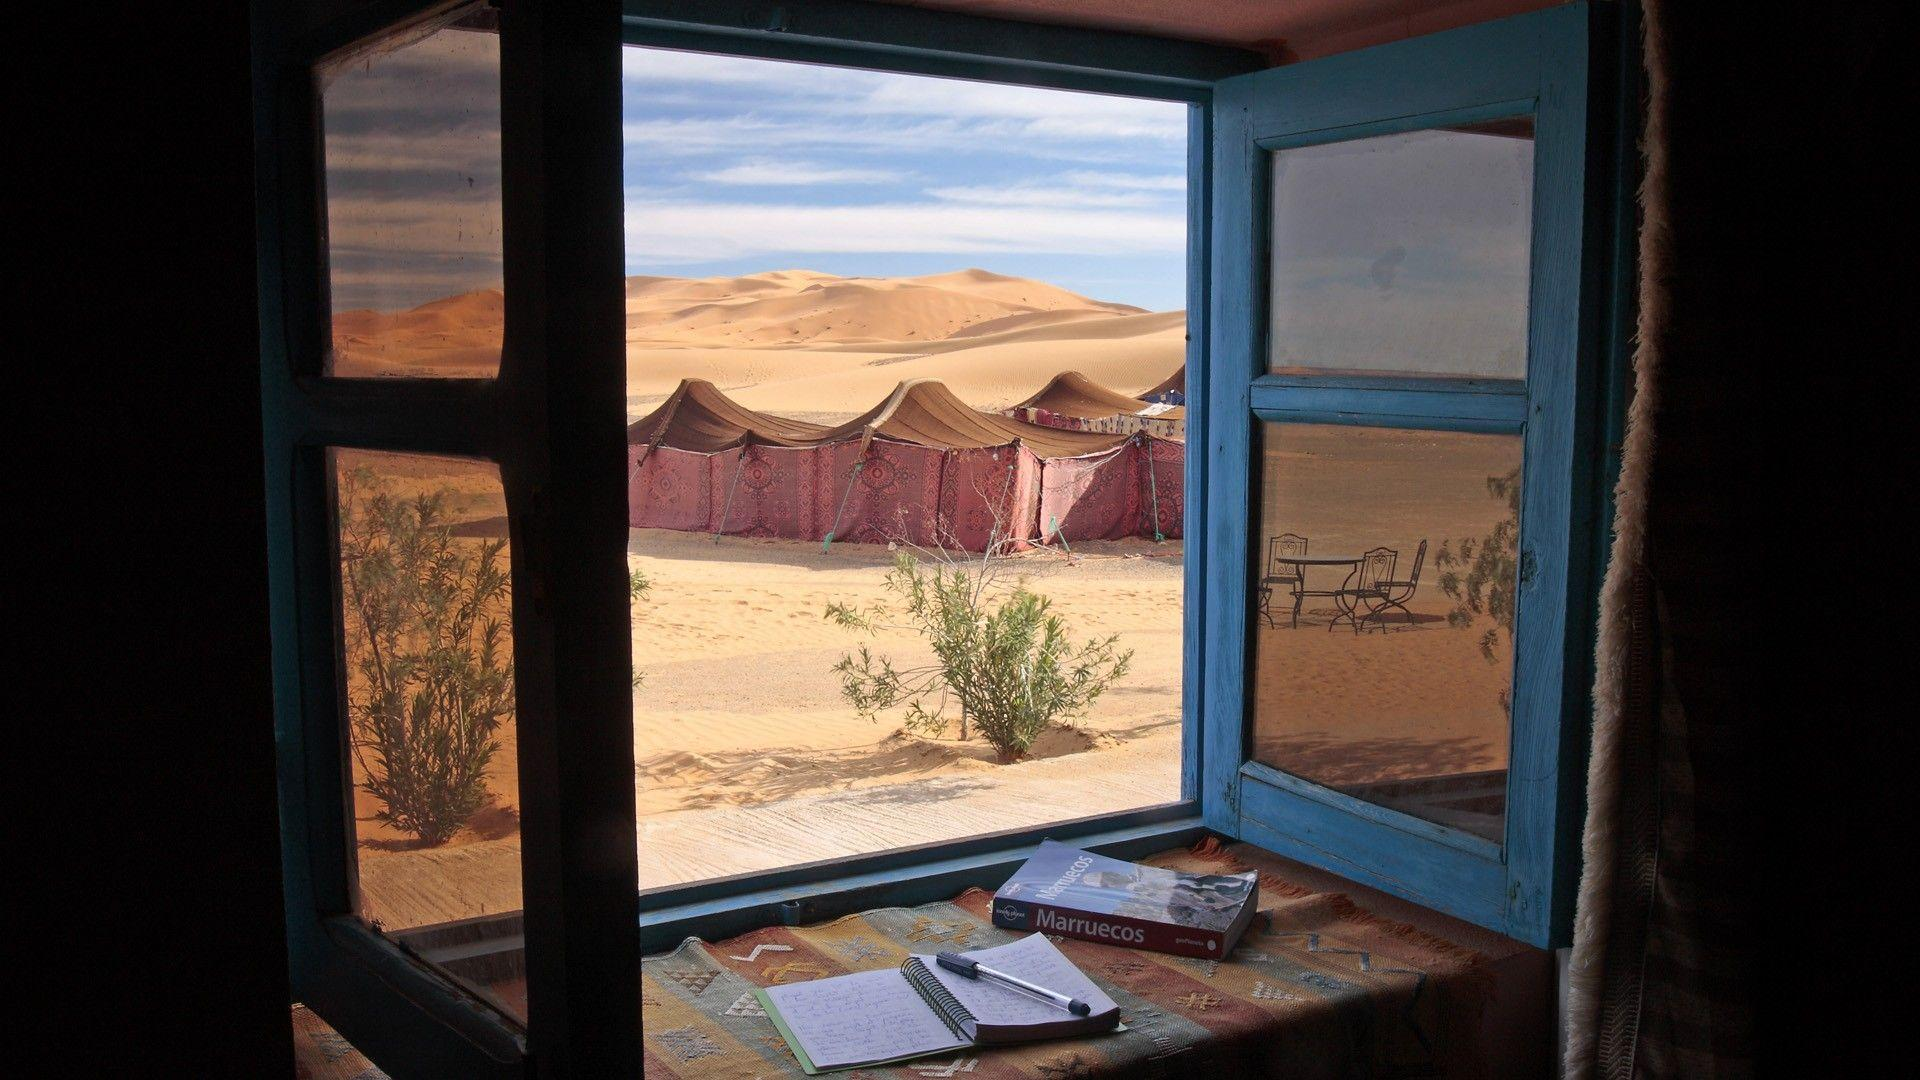 morocco wallpaper related keywords - photo #15